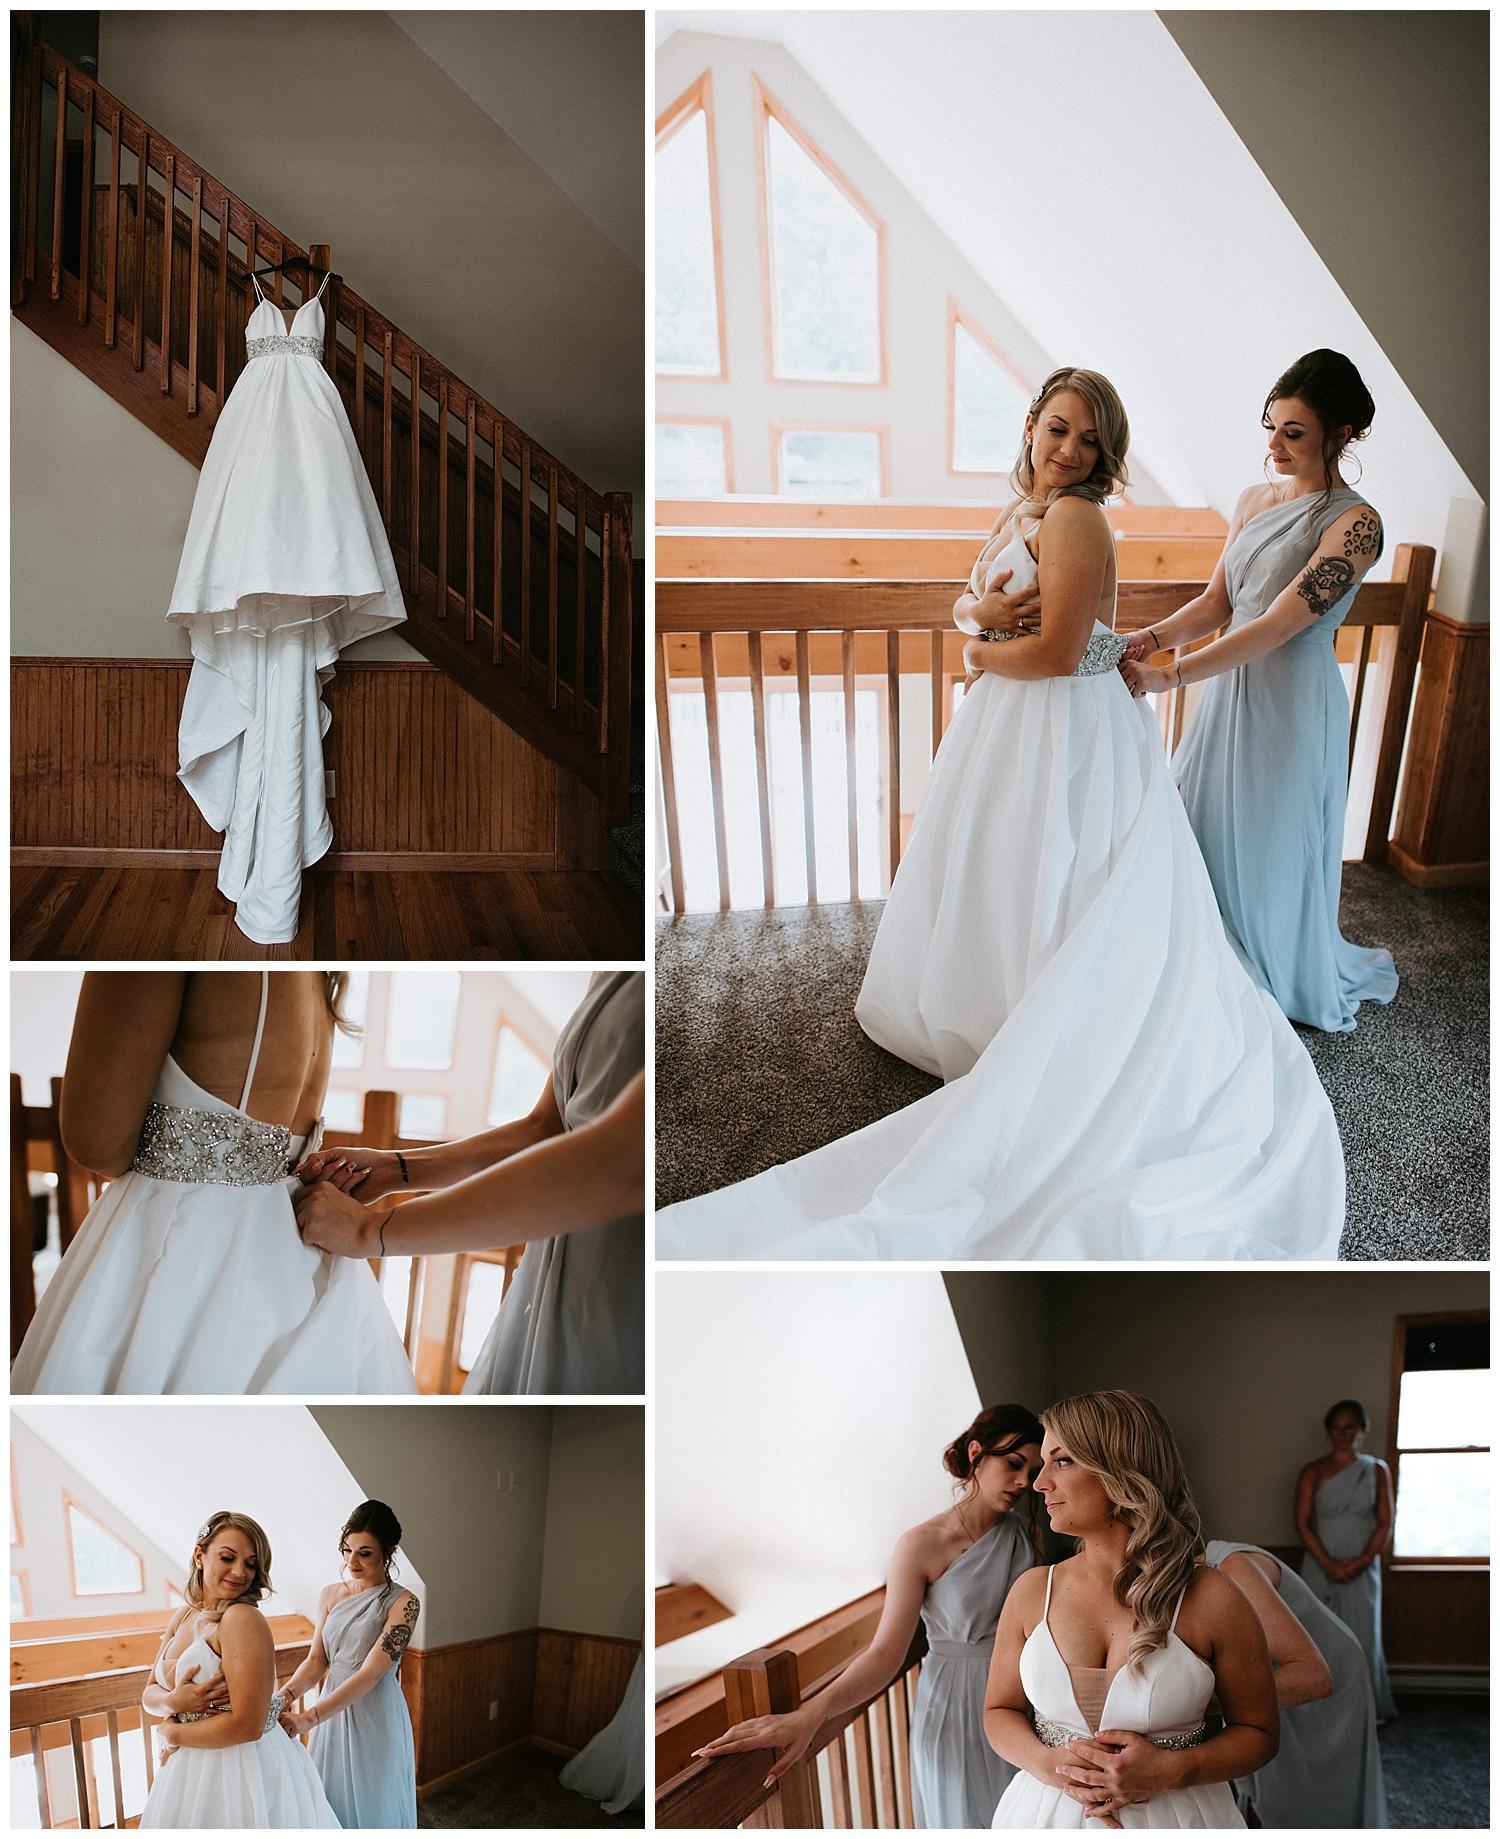 Destination-Wedding-Photographer-in-NEPA-Palmerton-PA_0003.jpg